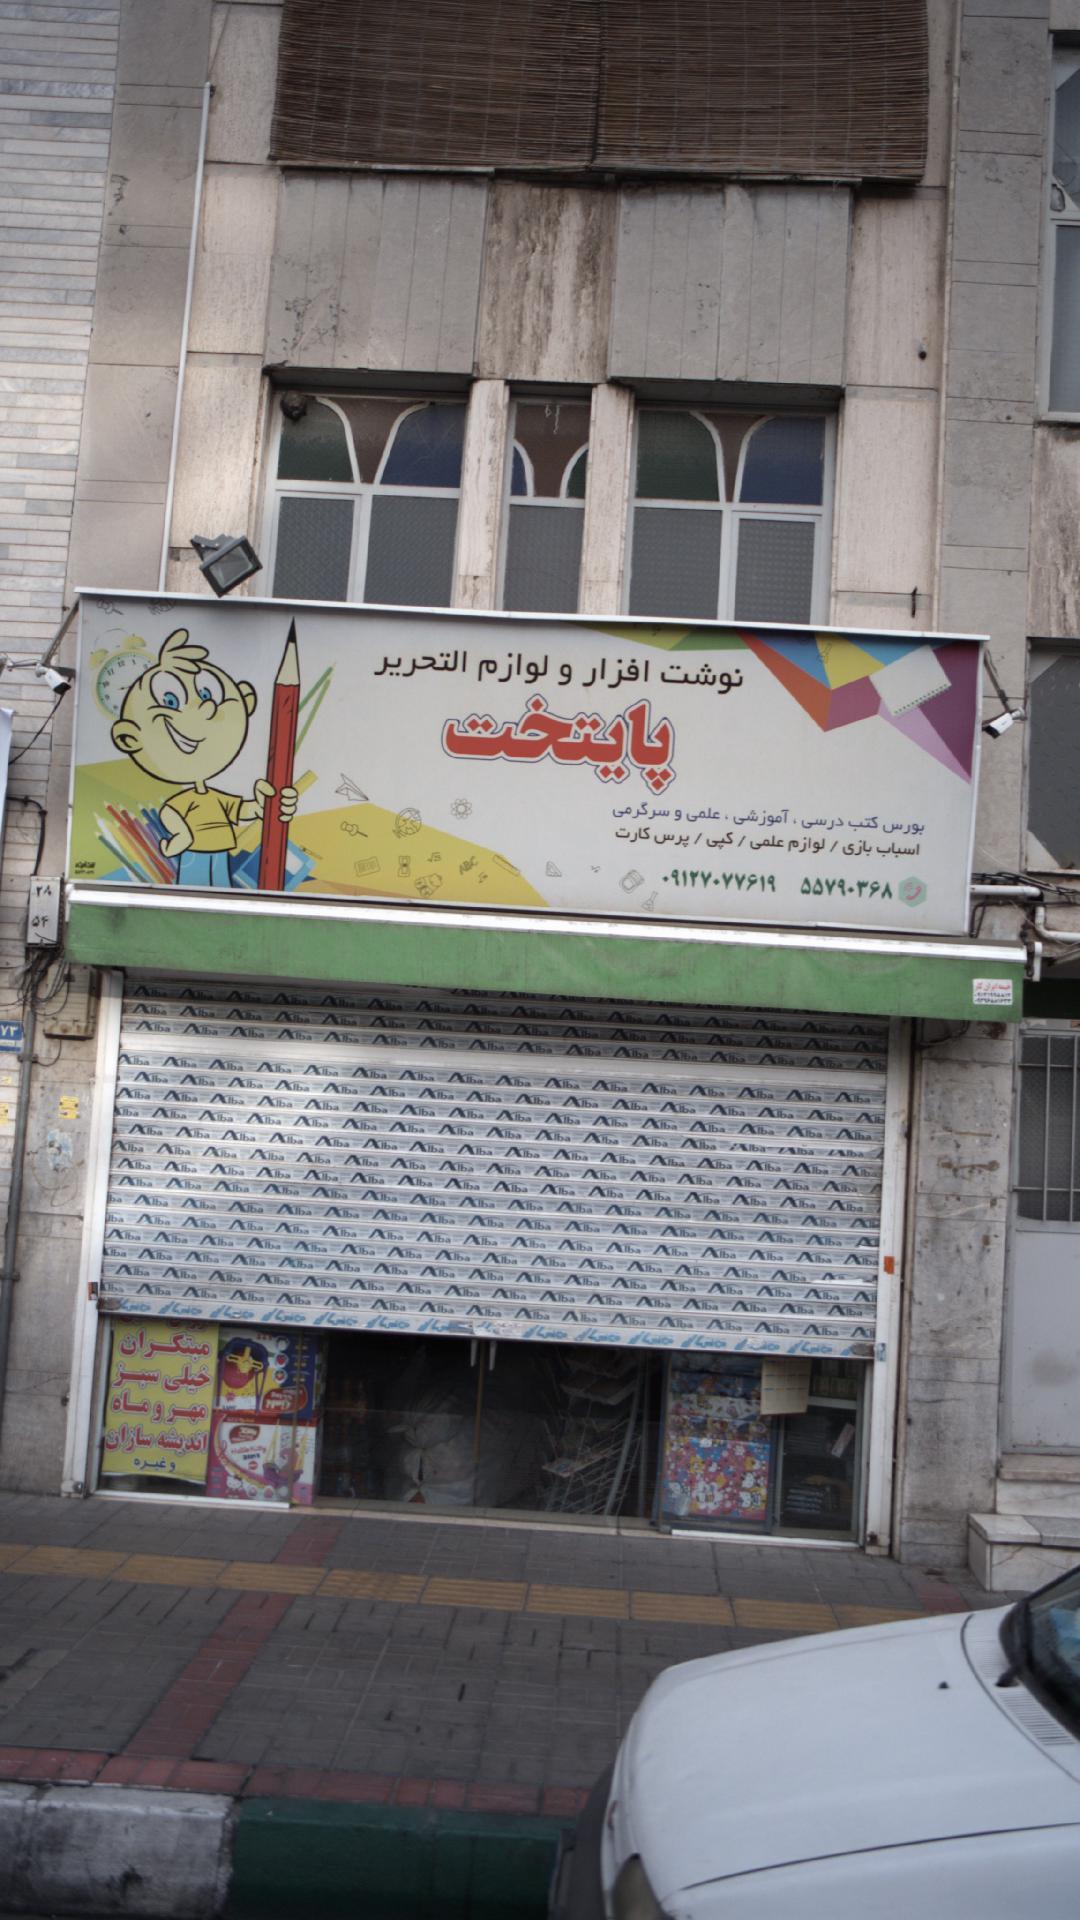 نوشت افزار و لوازم التحریر پایتخت